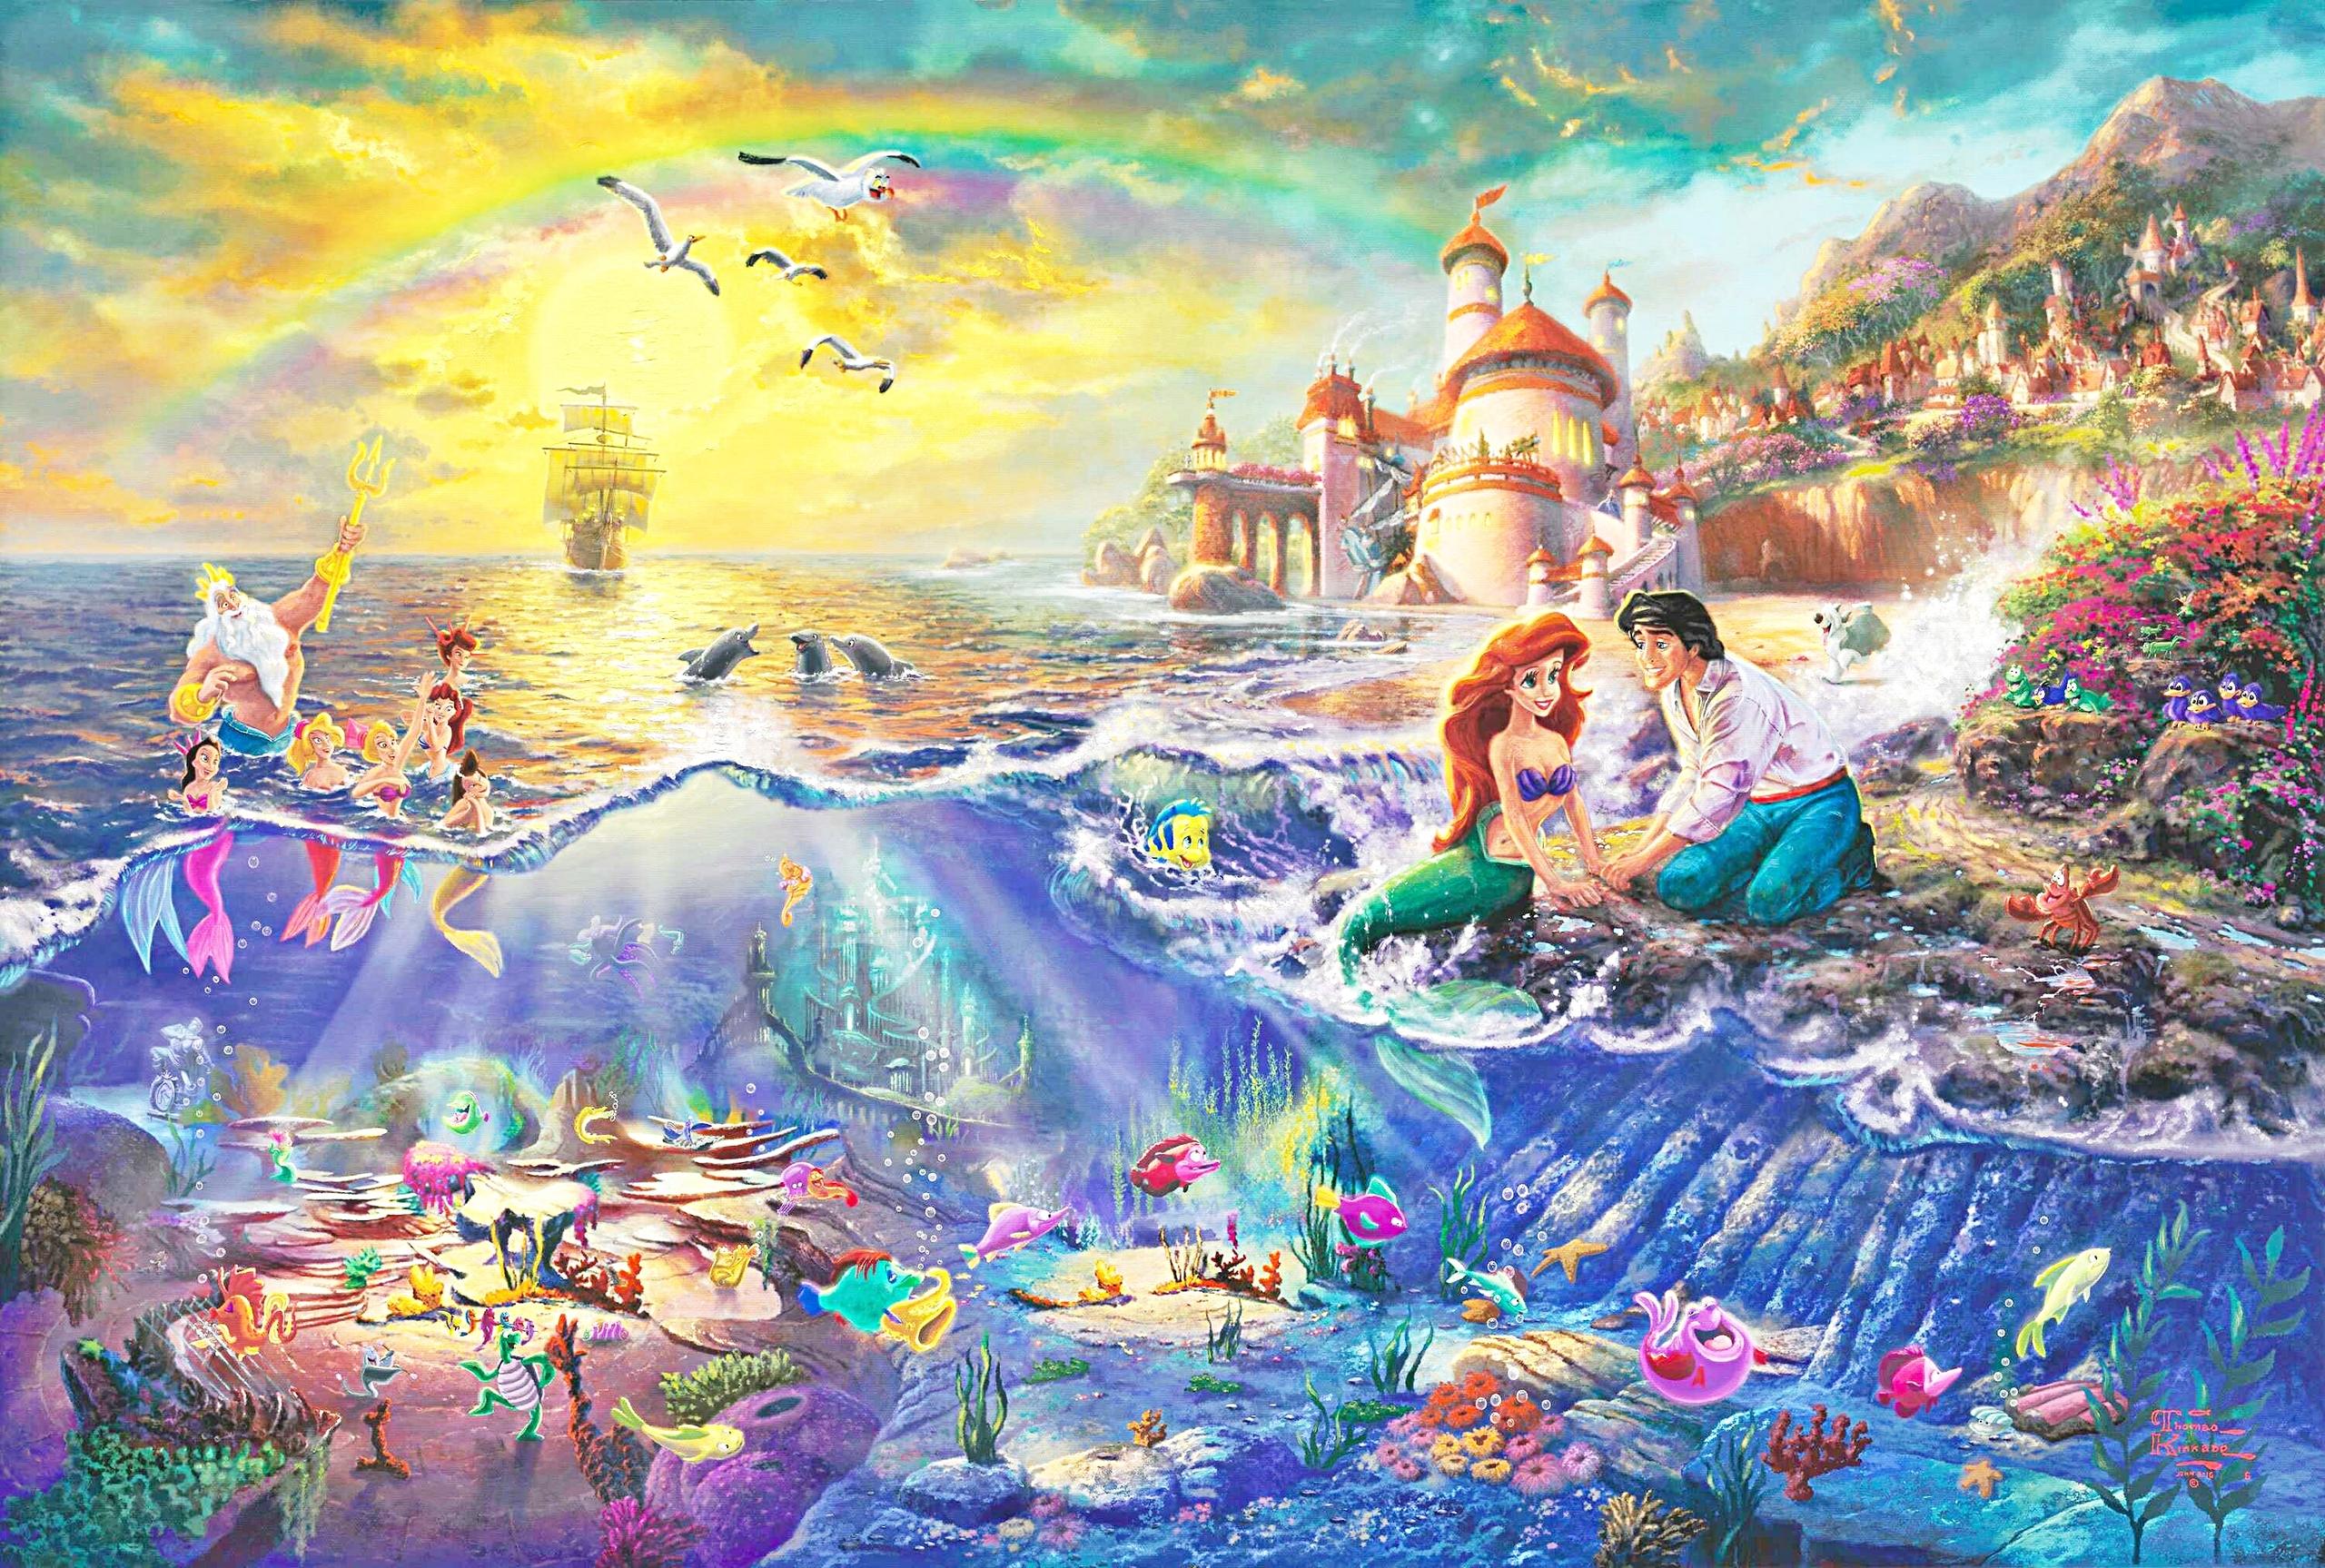 Thomas Kinkade s Disney Paintings The Little Mermaid walt disney 2560x1727